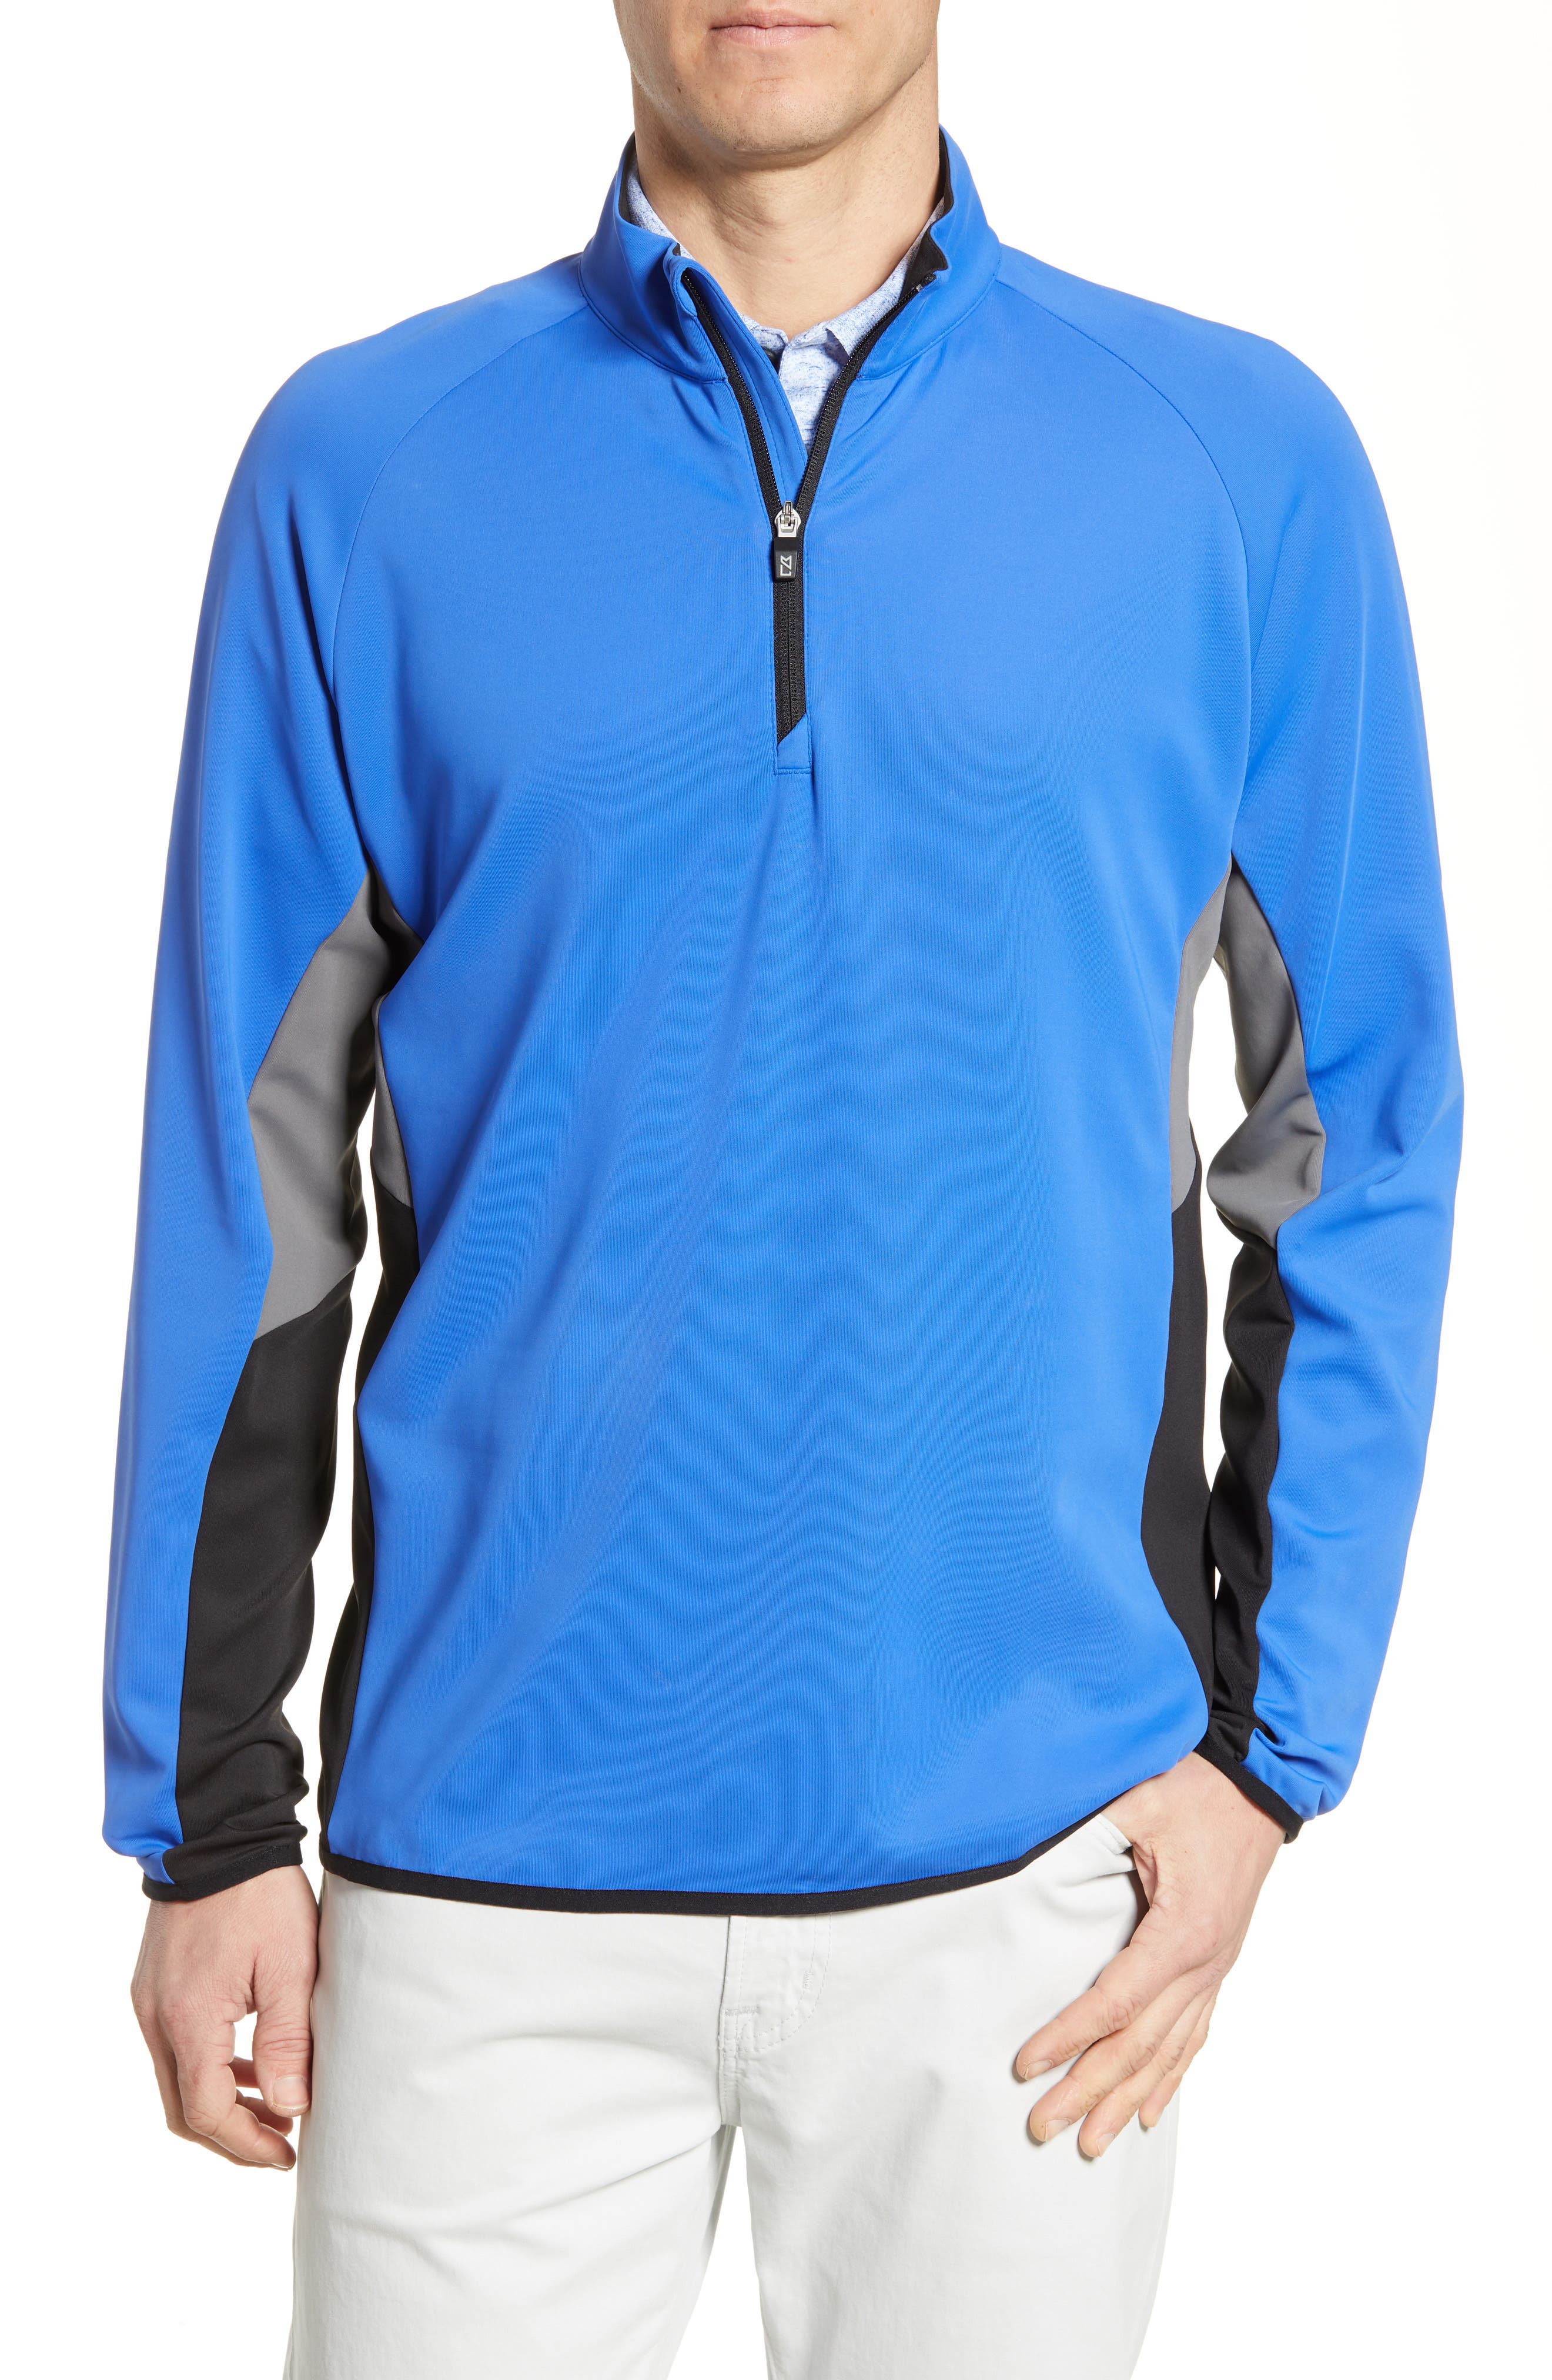 Traverse Colorblock Quarter Zip Pullover